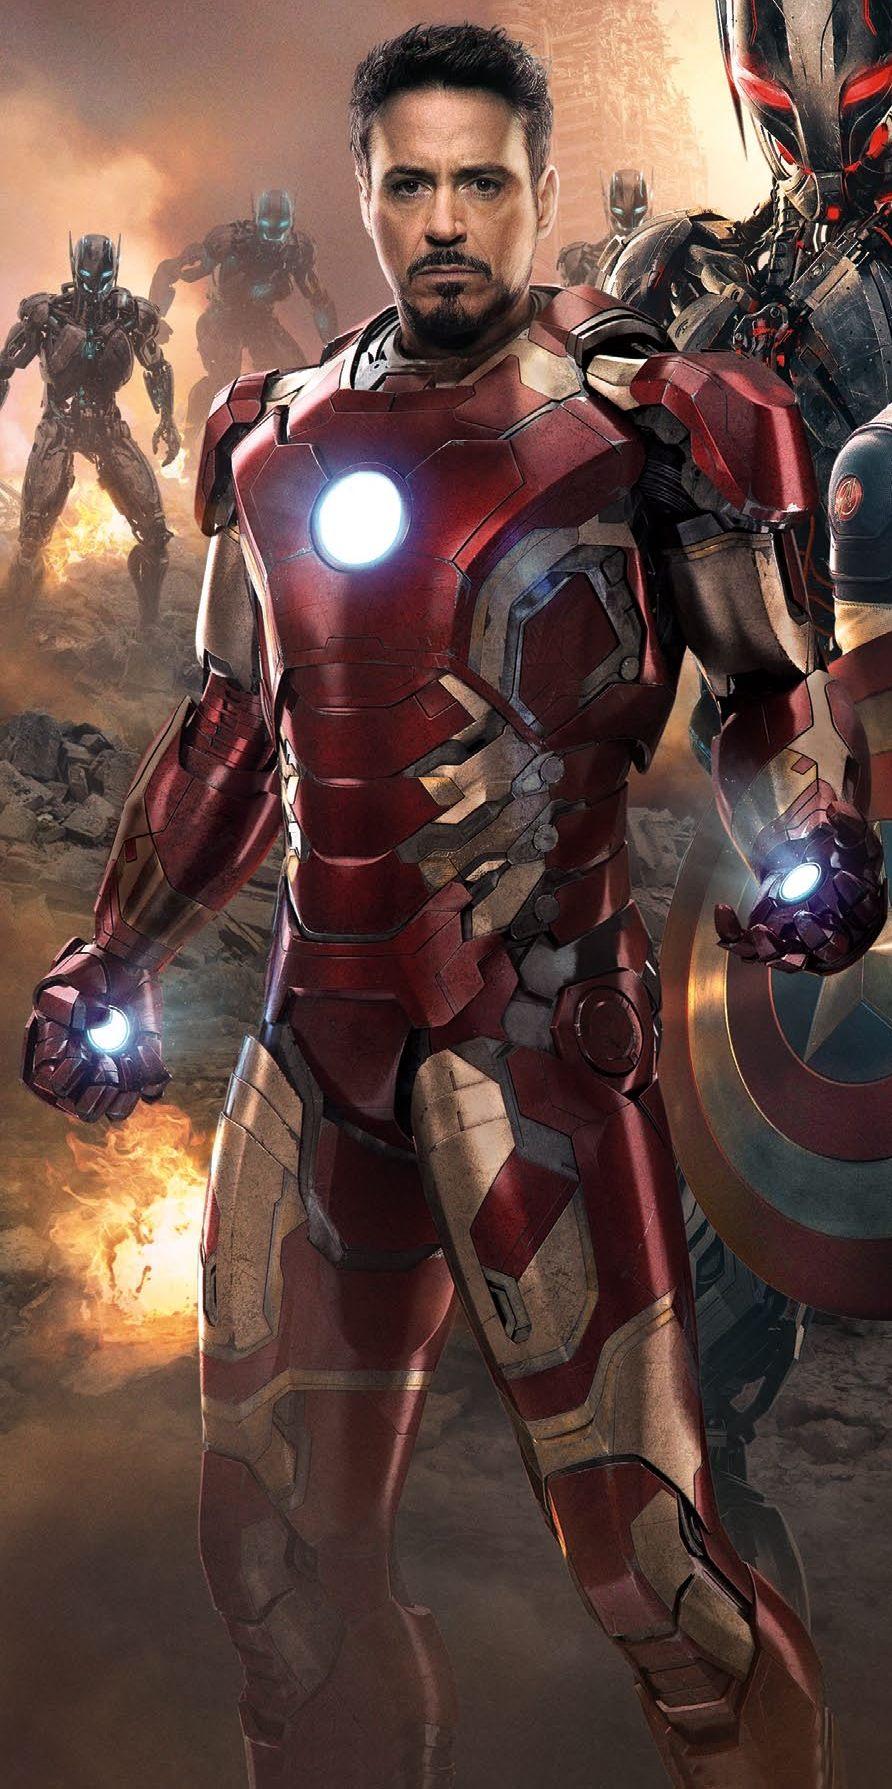 marvel - What is the in-universe reason Tony Stark leaves ...  |Tony Stark Iron Man 2 Hair